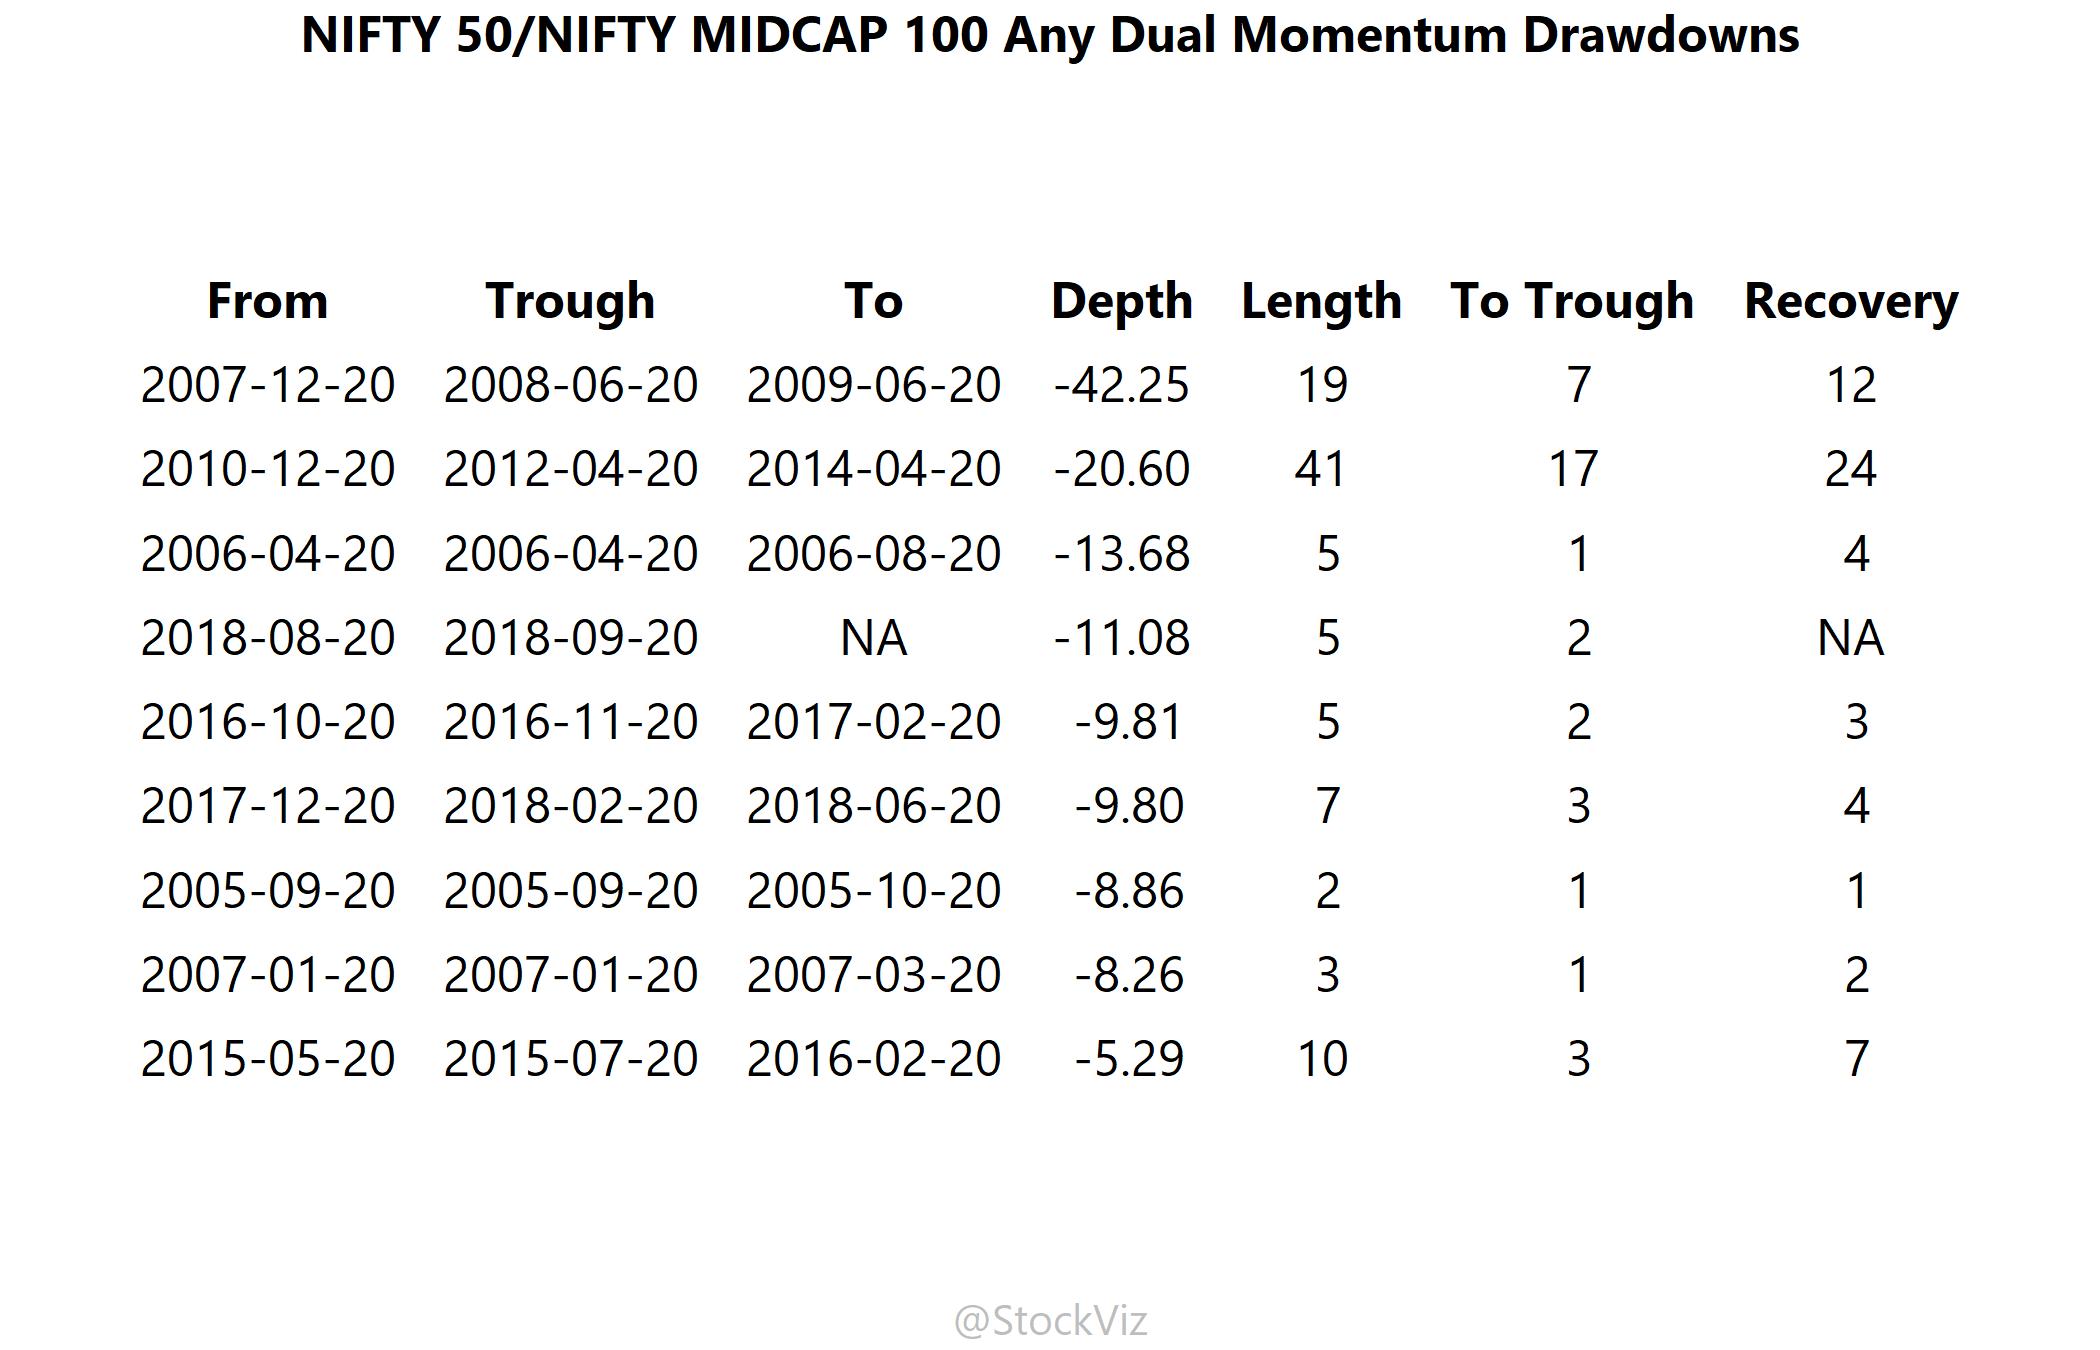 drawdowns of NIFTY 50/MIDCAP 100 dual momentum over any lookback